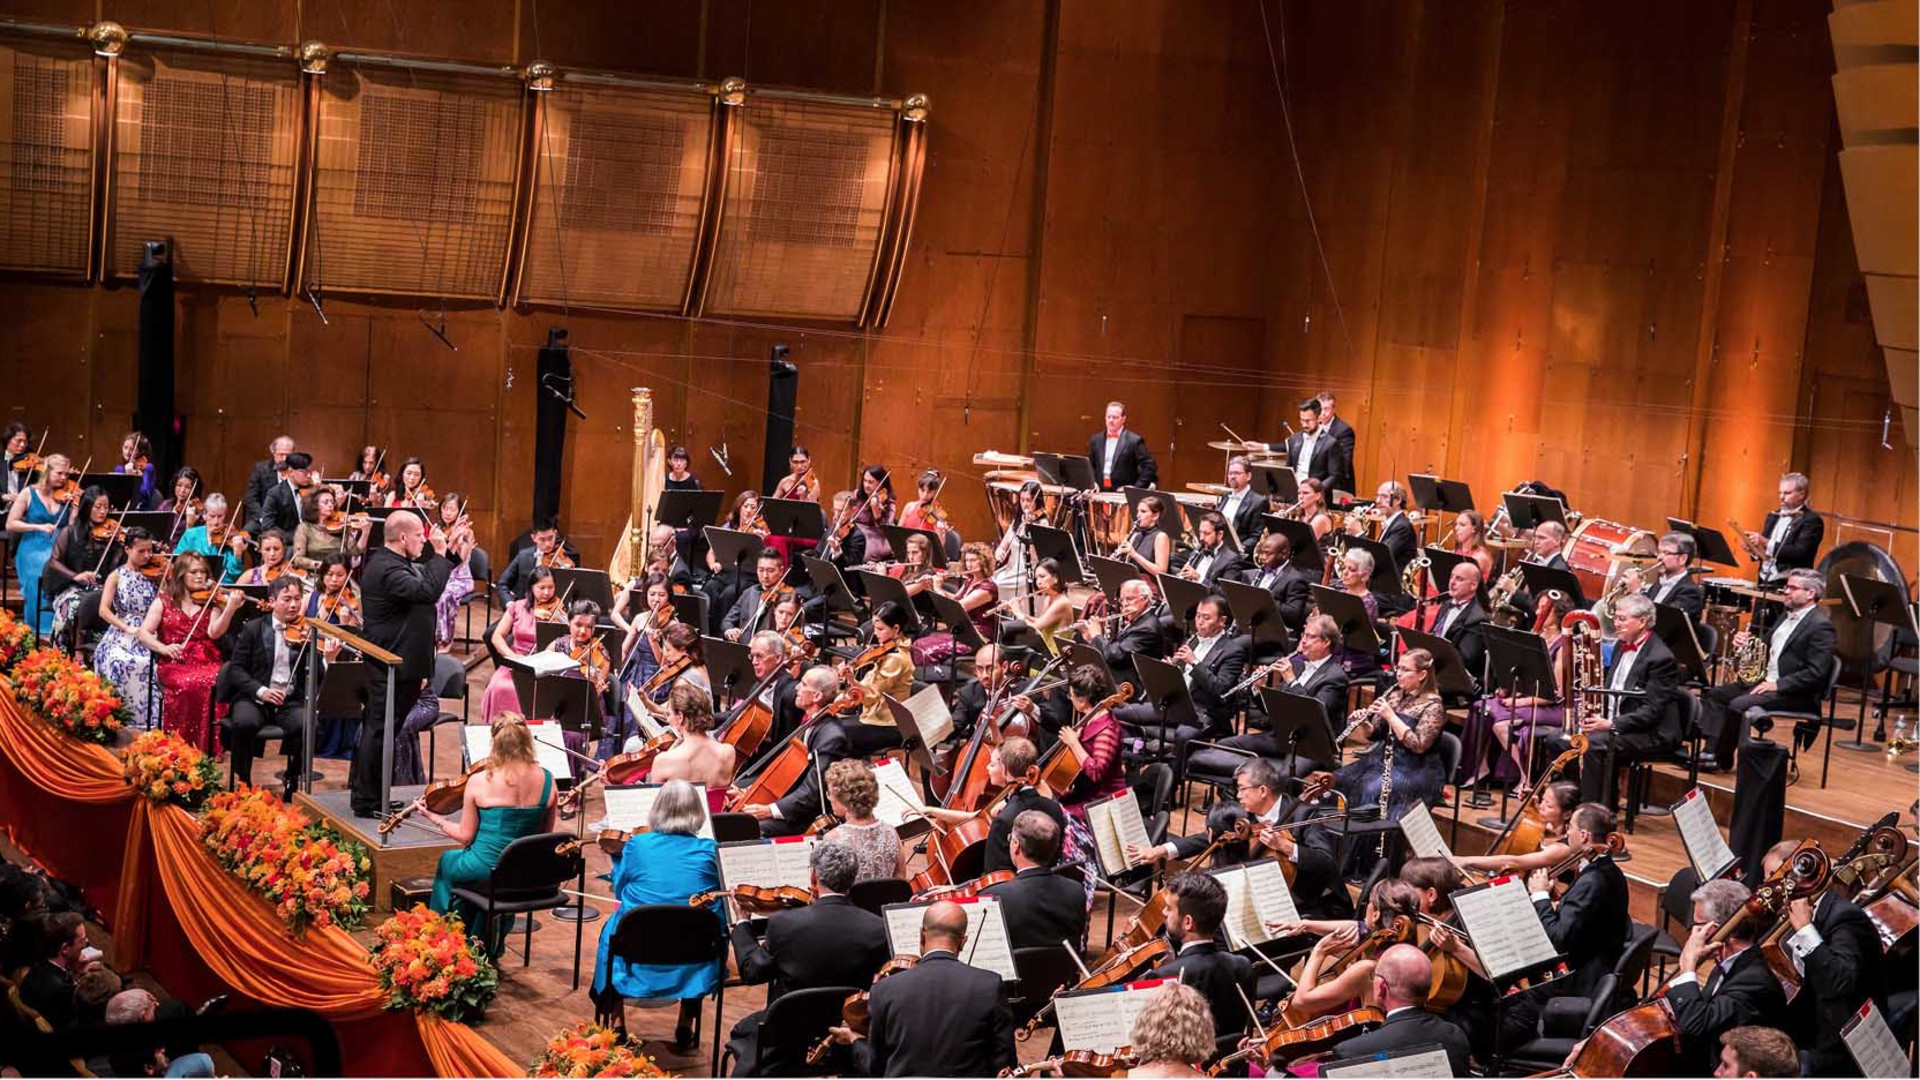 IMPORT Opening Night Gala: New York, Meet Jaap, at David Geffen Hall at Lincoln Center